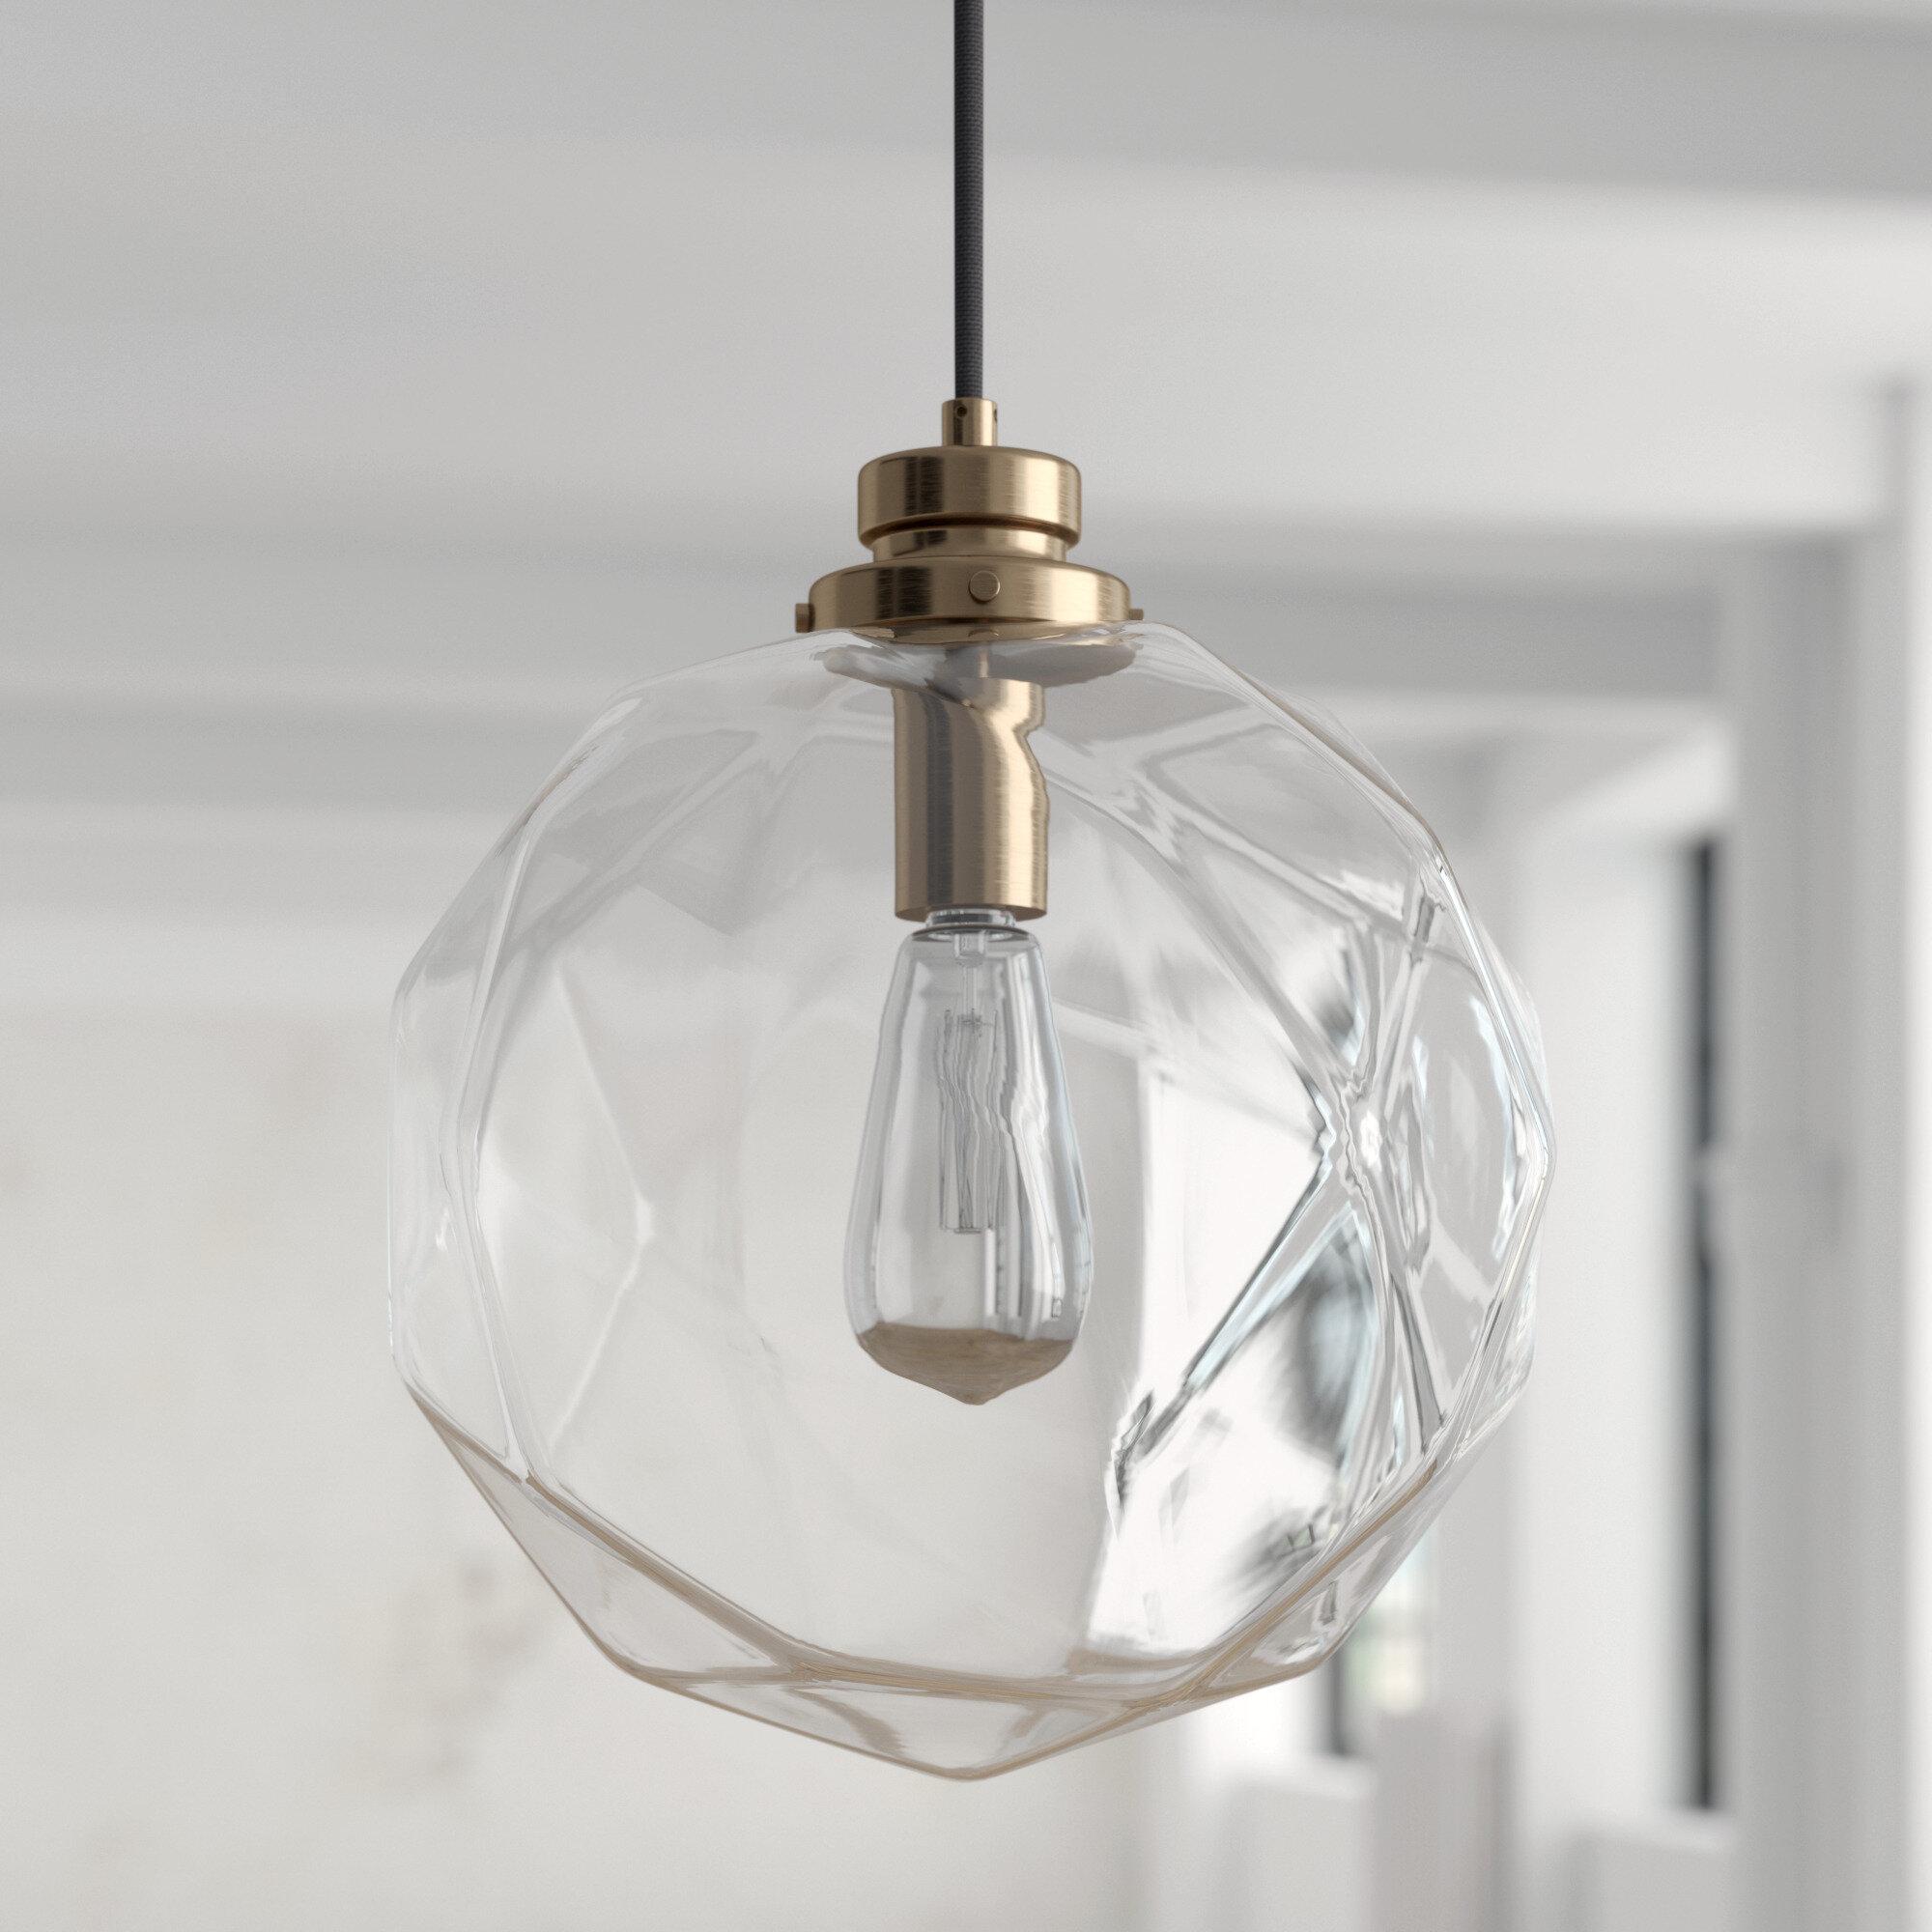 1 Light Geometric Globe Pendant In 1 Light Geometric Globe Pendants (Gallery 2 of 30)